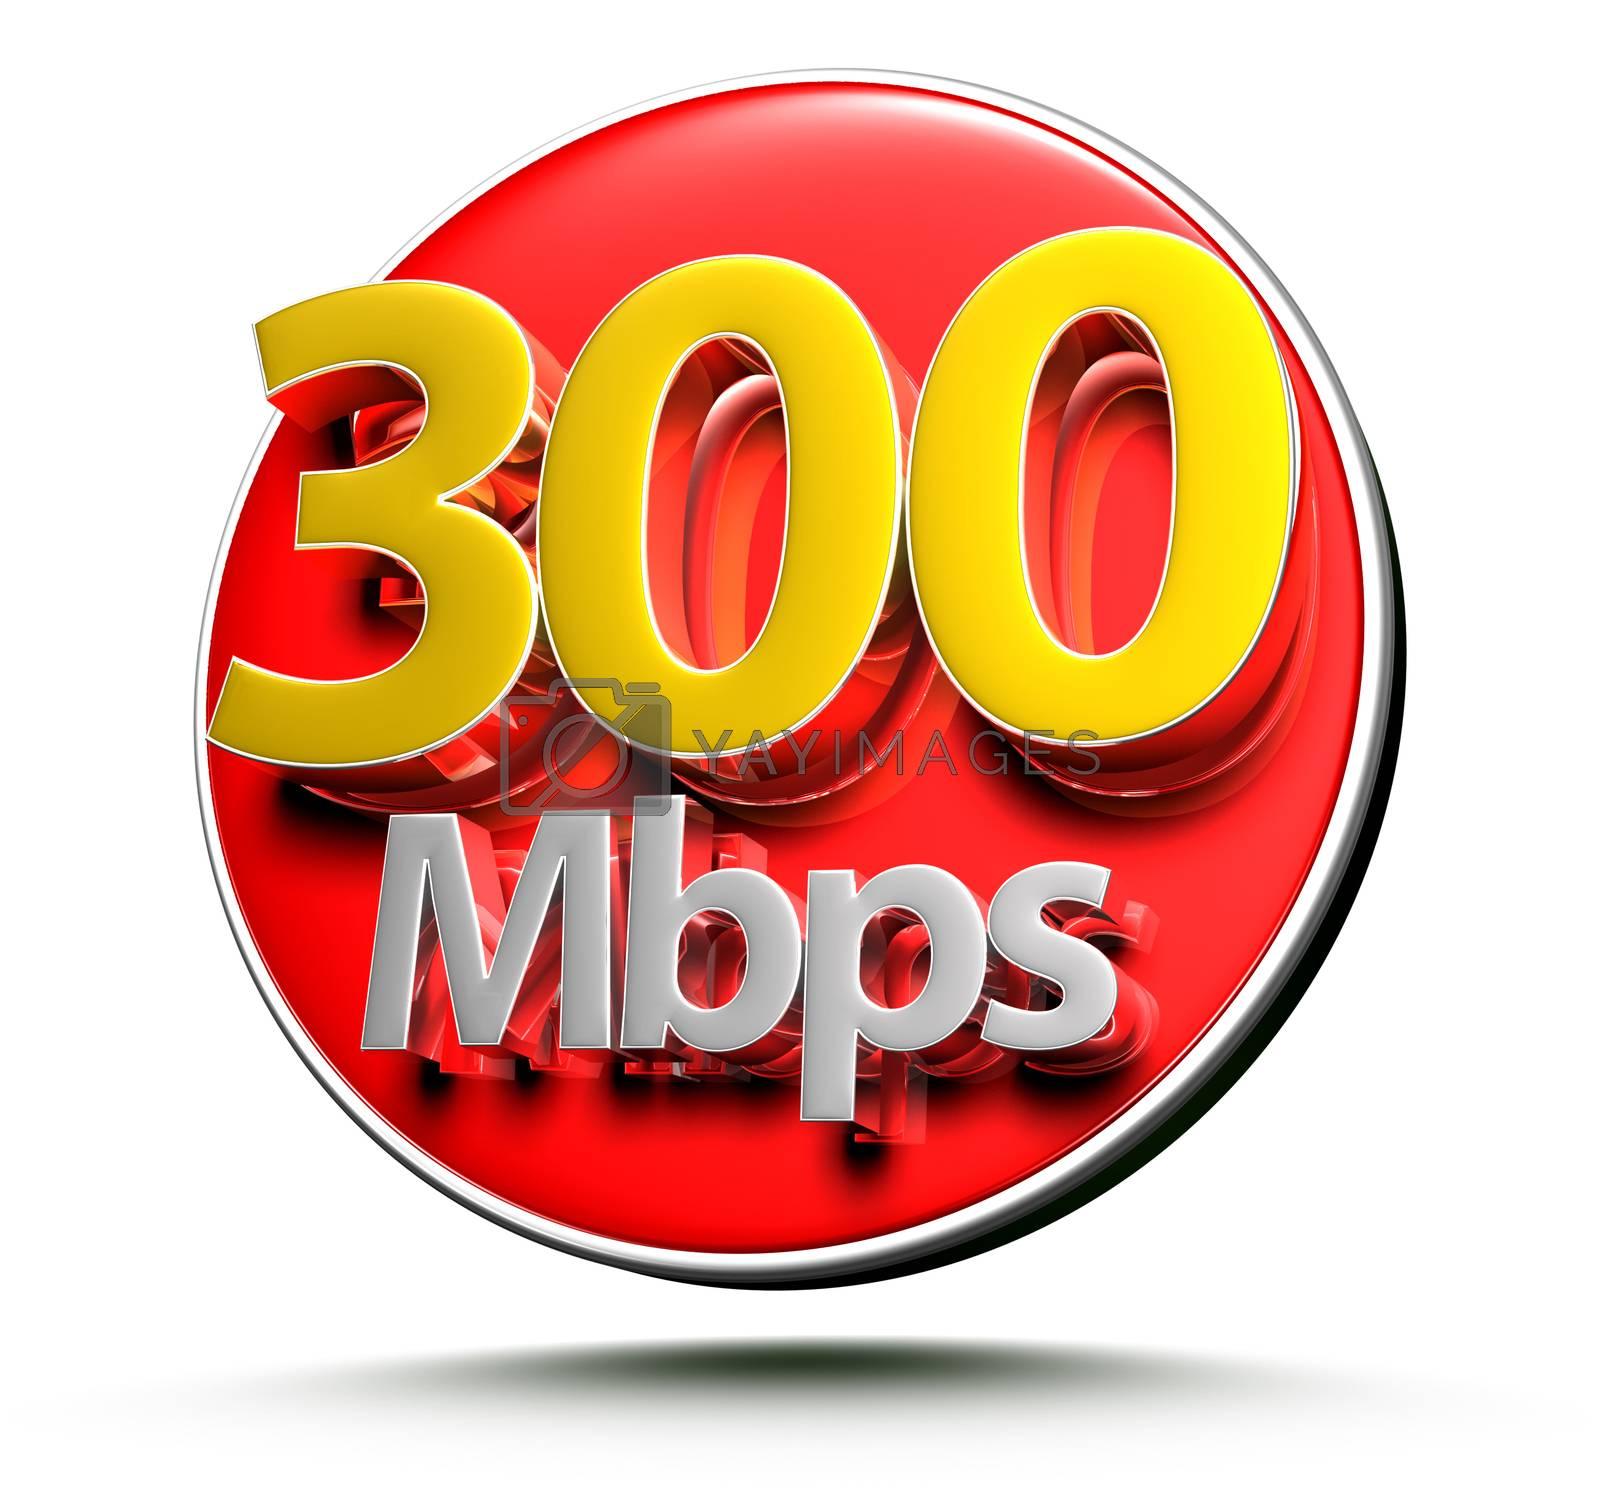 300 mbps 3d. by thitimontoyai